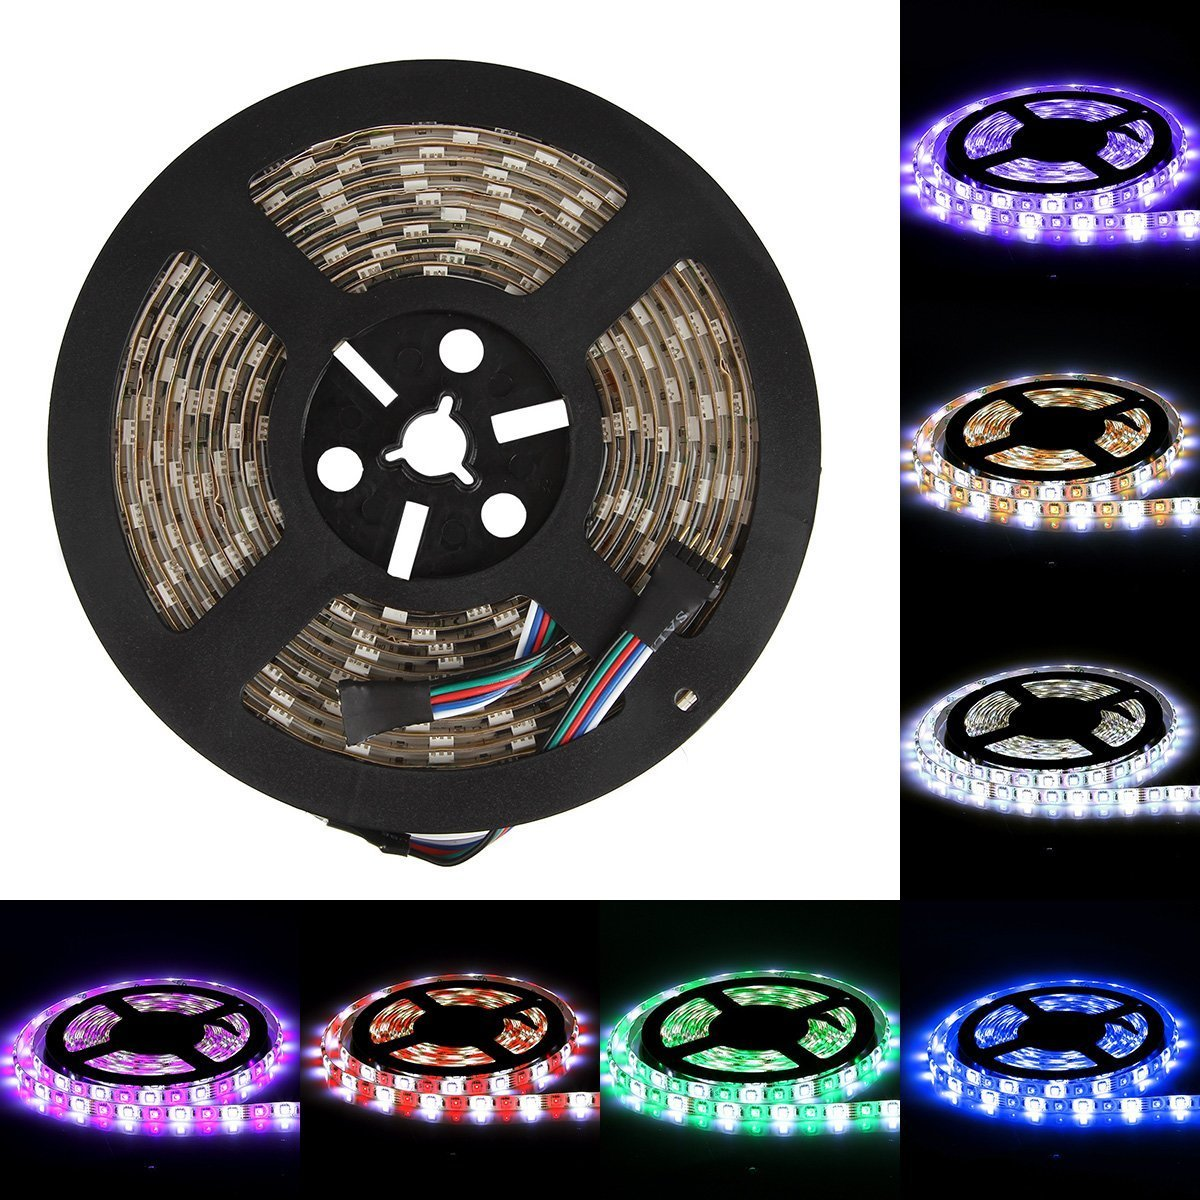 Striscia RGB Supernutlight 12v SMD Strip 5050 Strisce LED Impermeabile IP65 Flessibile 16.4ft//5M 300LEDs per Decorazioni LED Home Solo Strisce LED